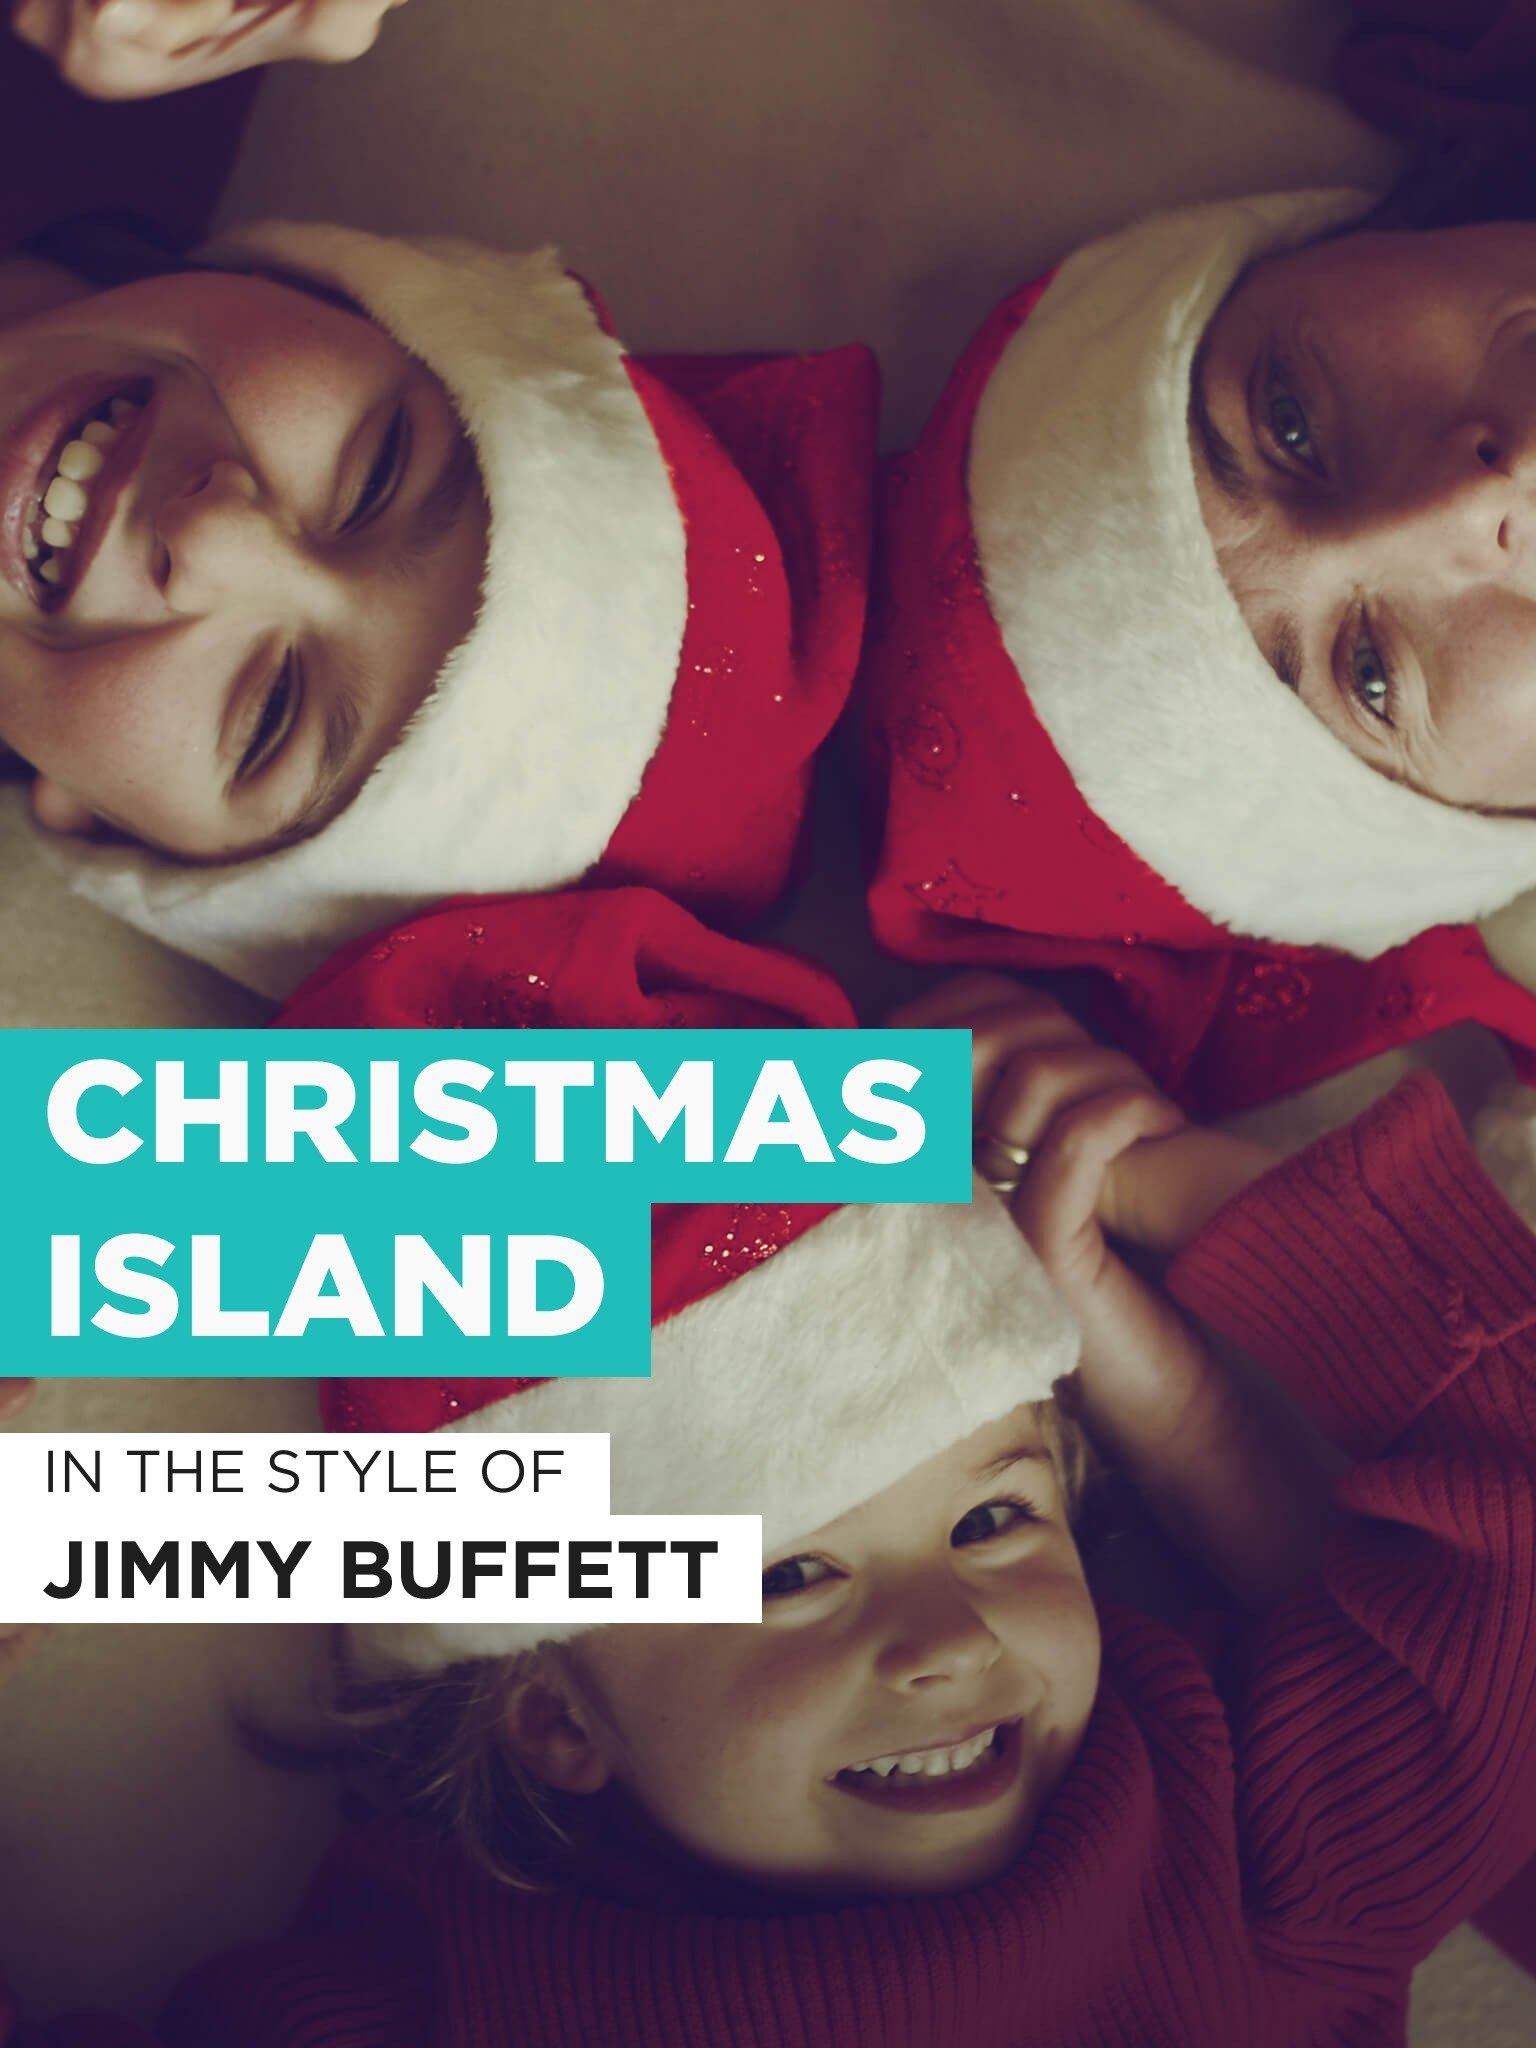 Amazon.com: Christmas Island: Jimmy Buffett, Not specifed, L Moraine